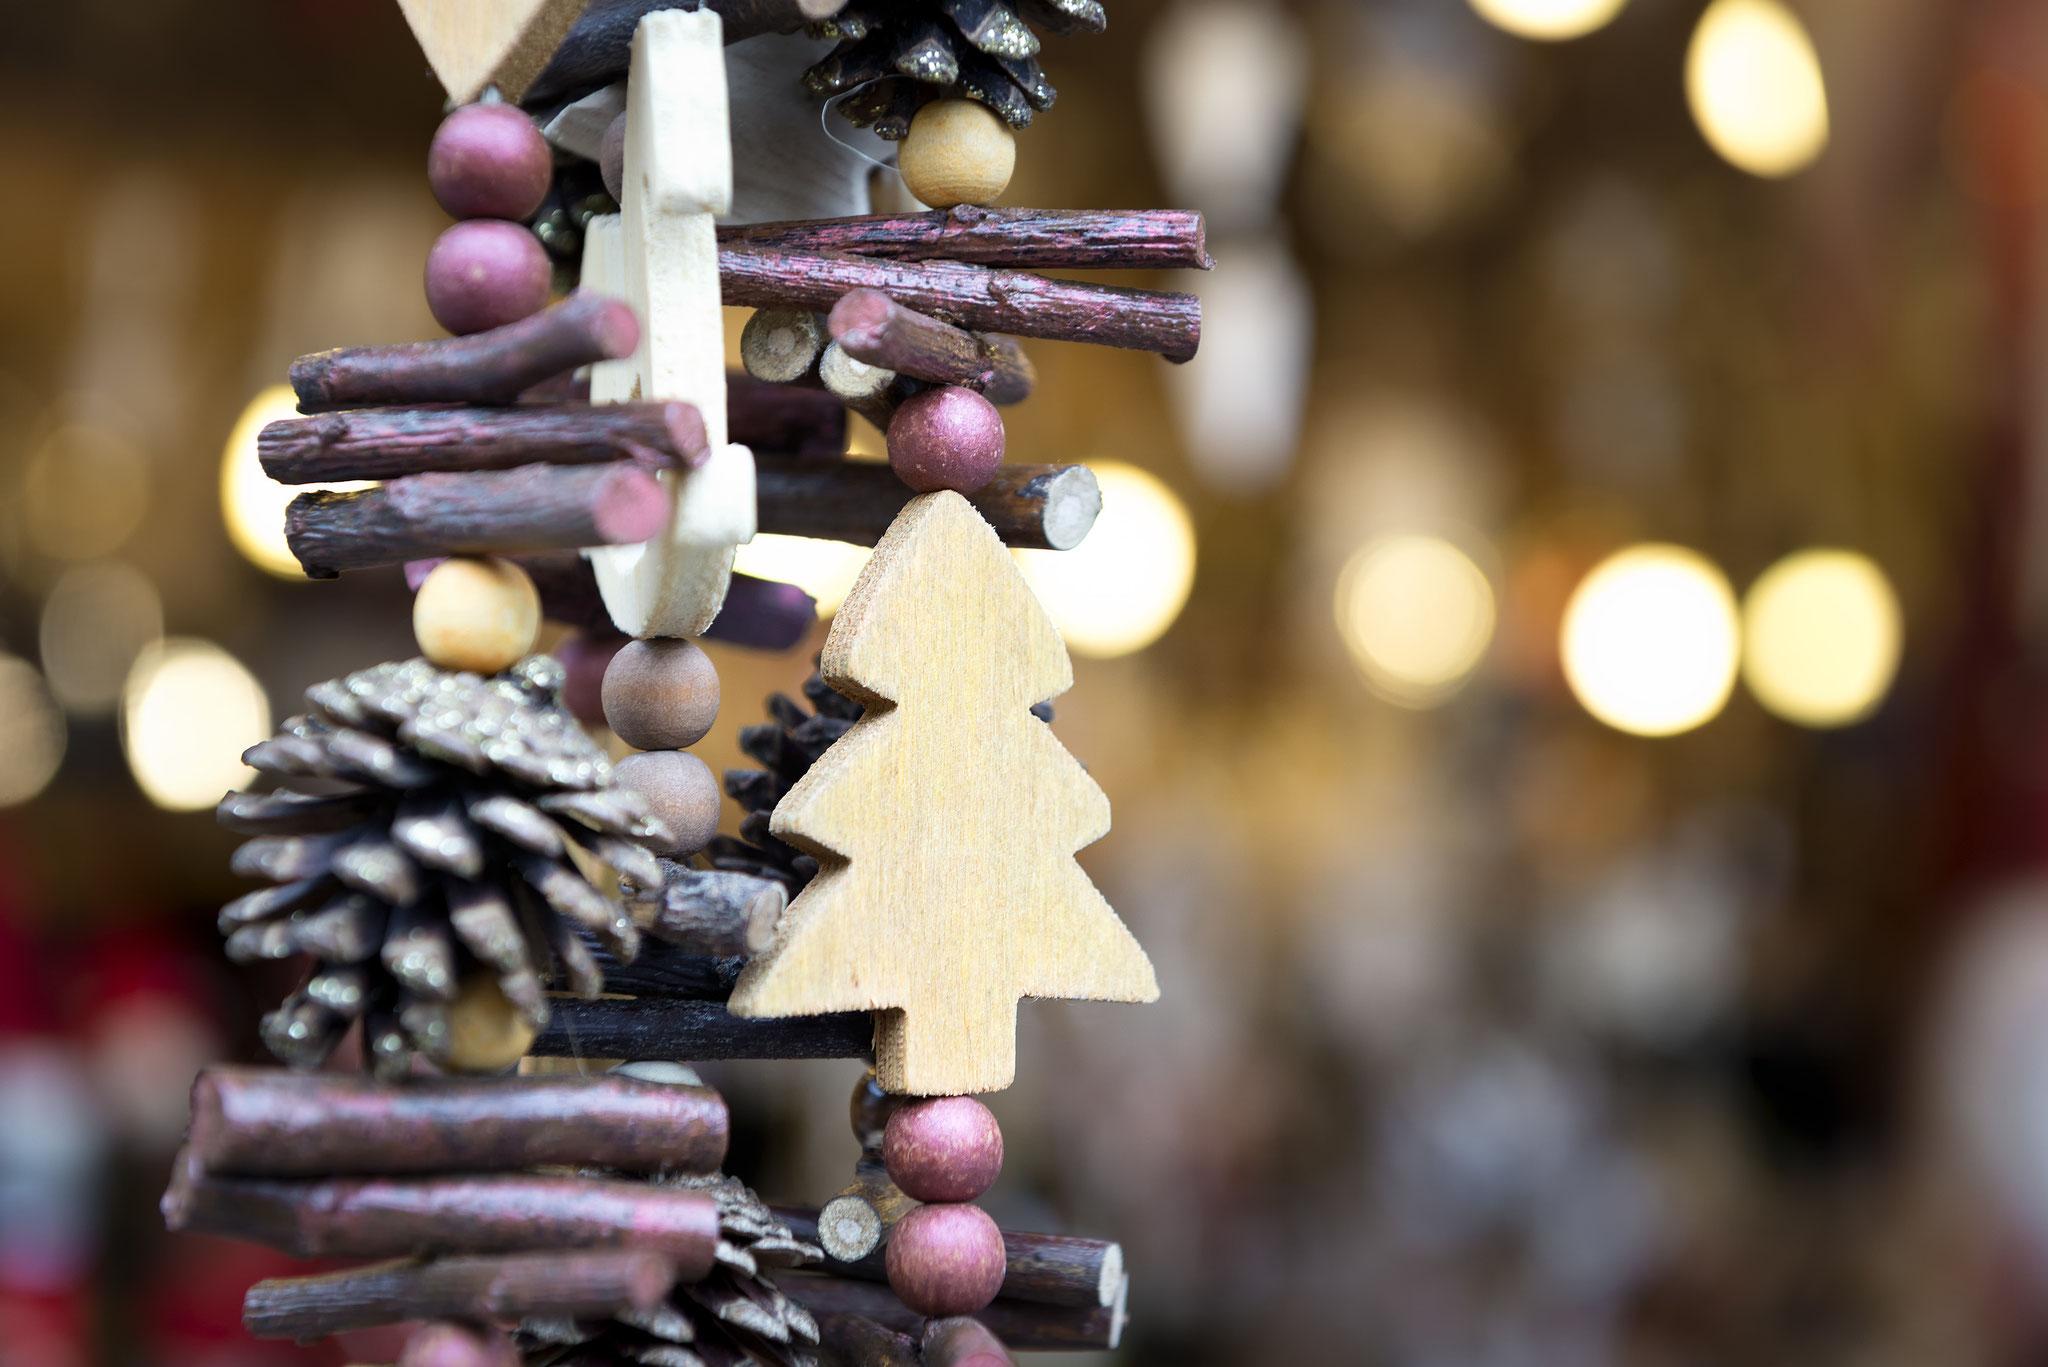 Sa, 30. November, 14.30 bis 18 Uhr: Adventsmarkt Mahlsdorf, Hönower Straße 67 | © Wolfgang Zwanzger, Adobe Stock